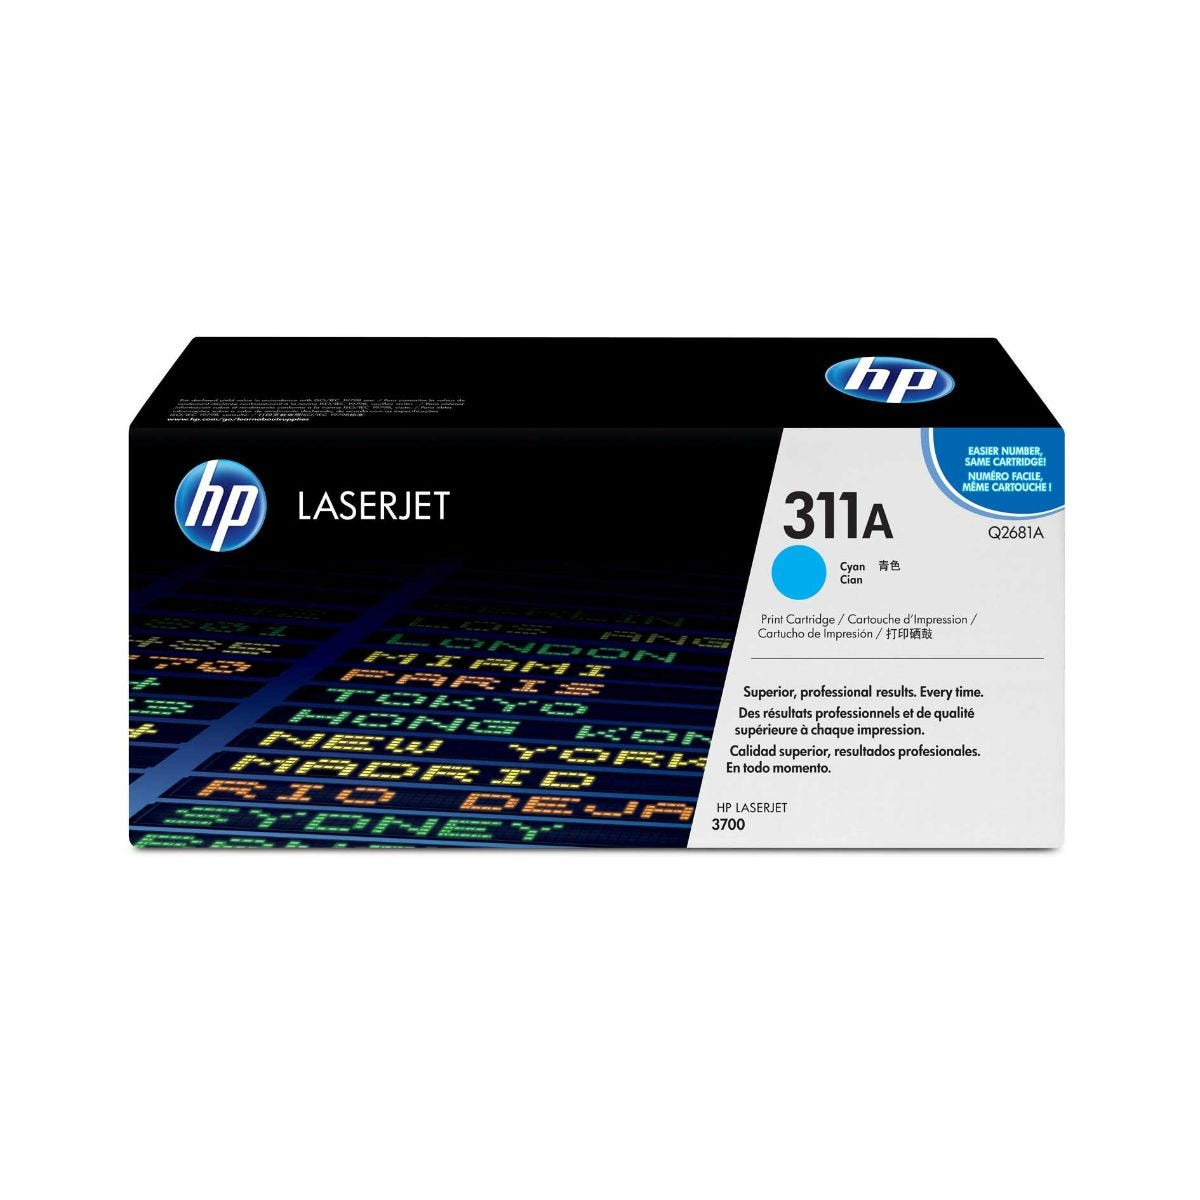 Image of HP 311A Laser Printer Ink Toner Cartridge Q2681A, Cyan